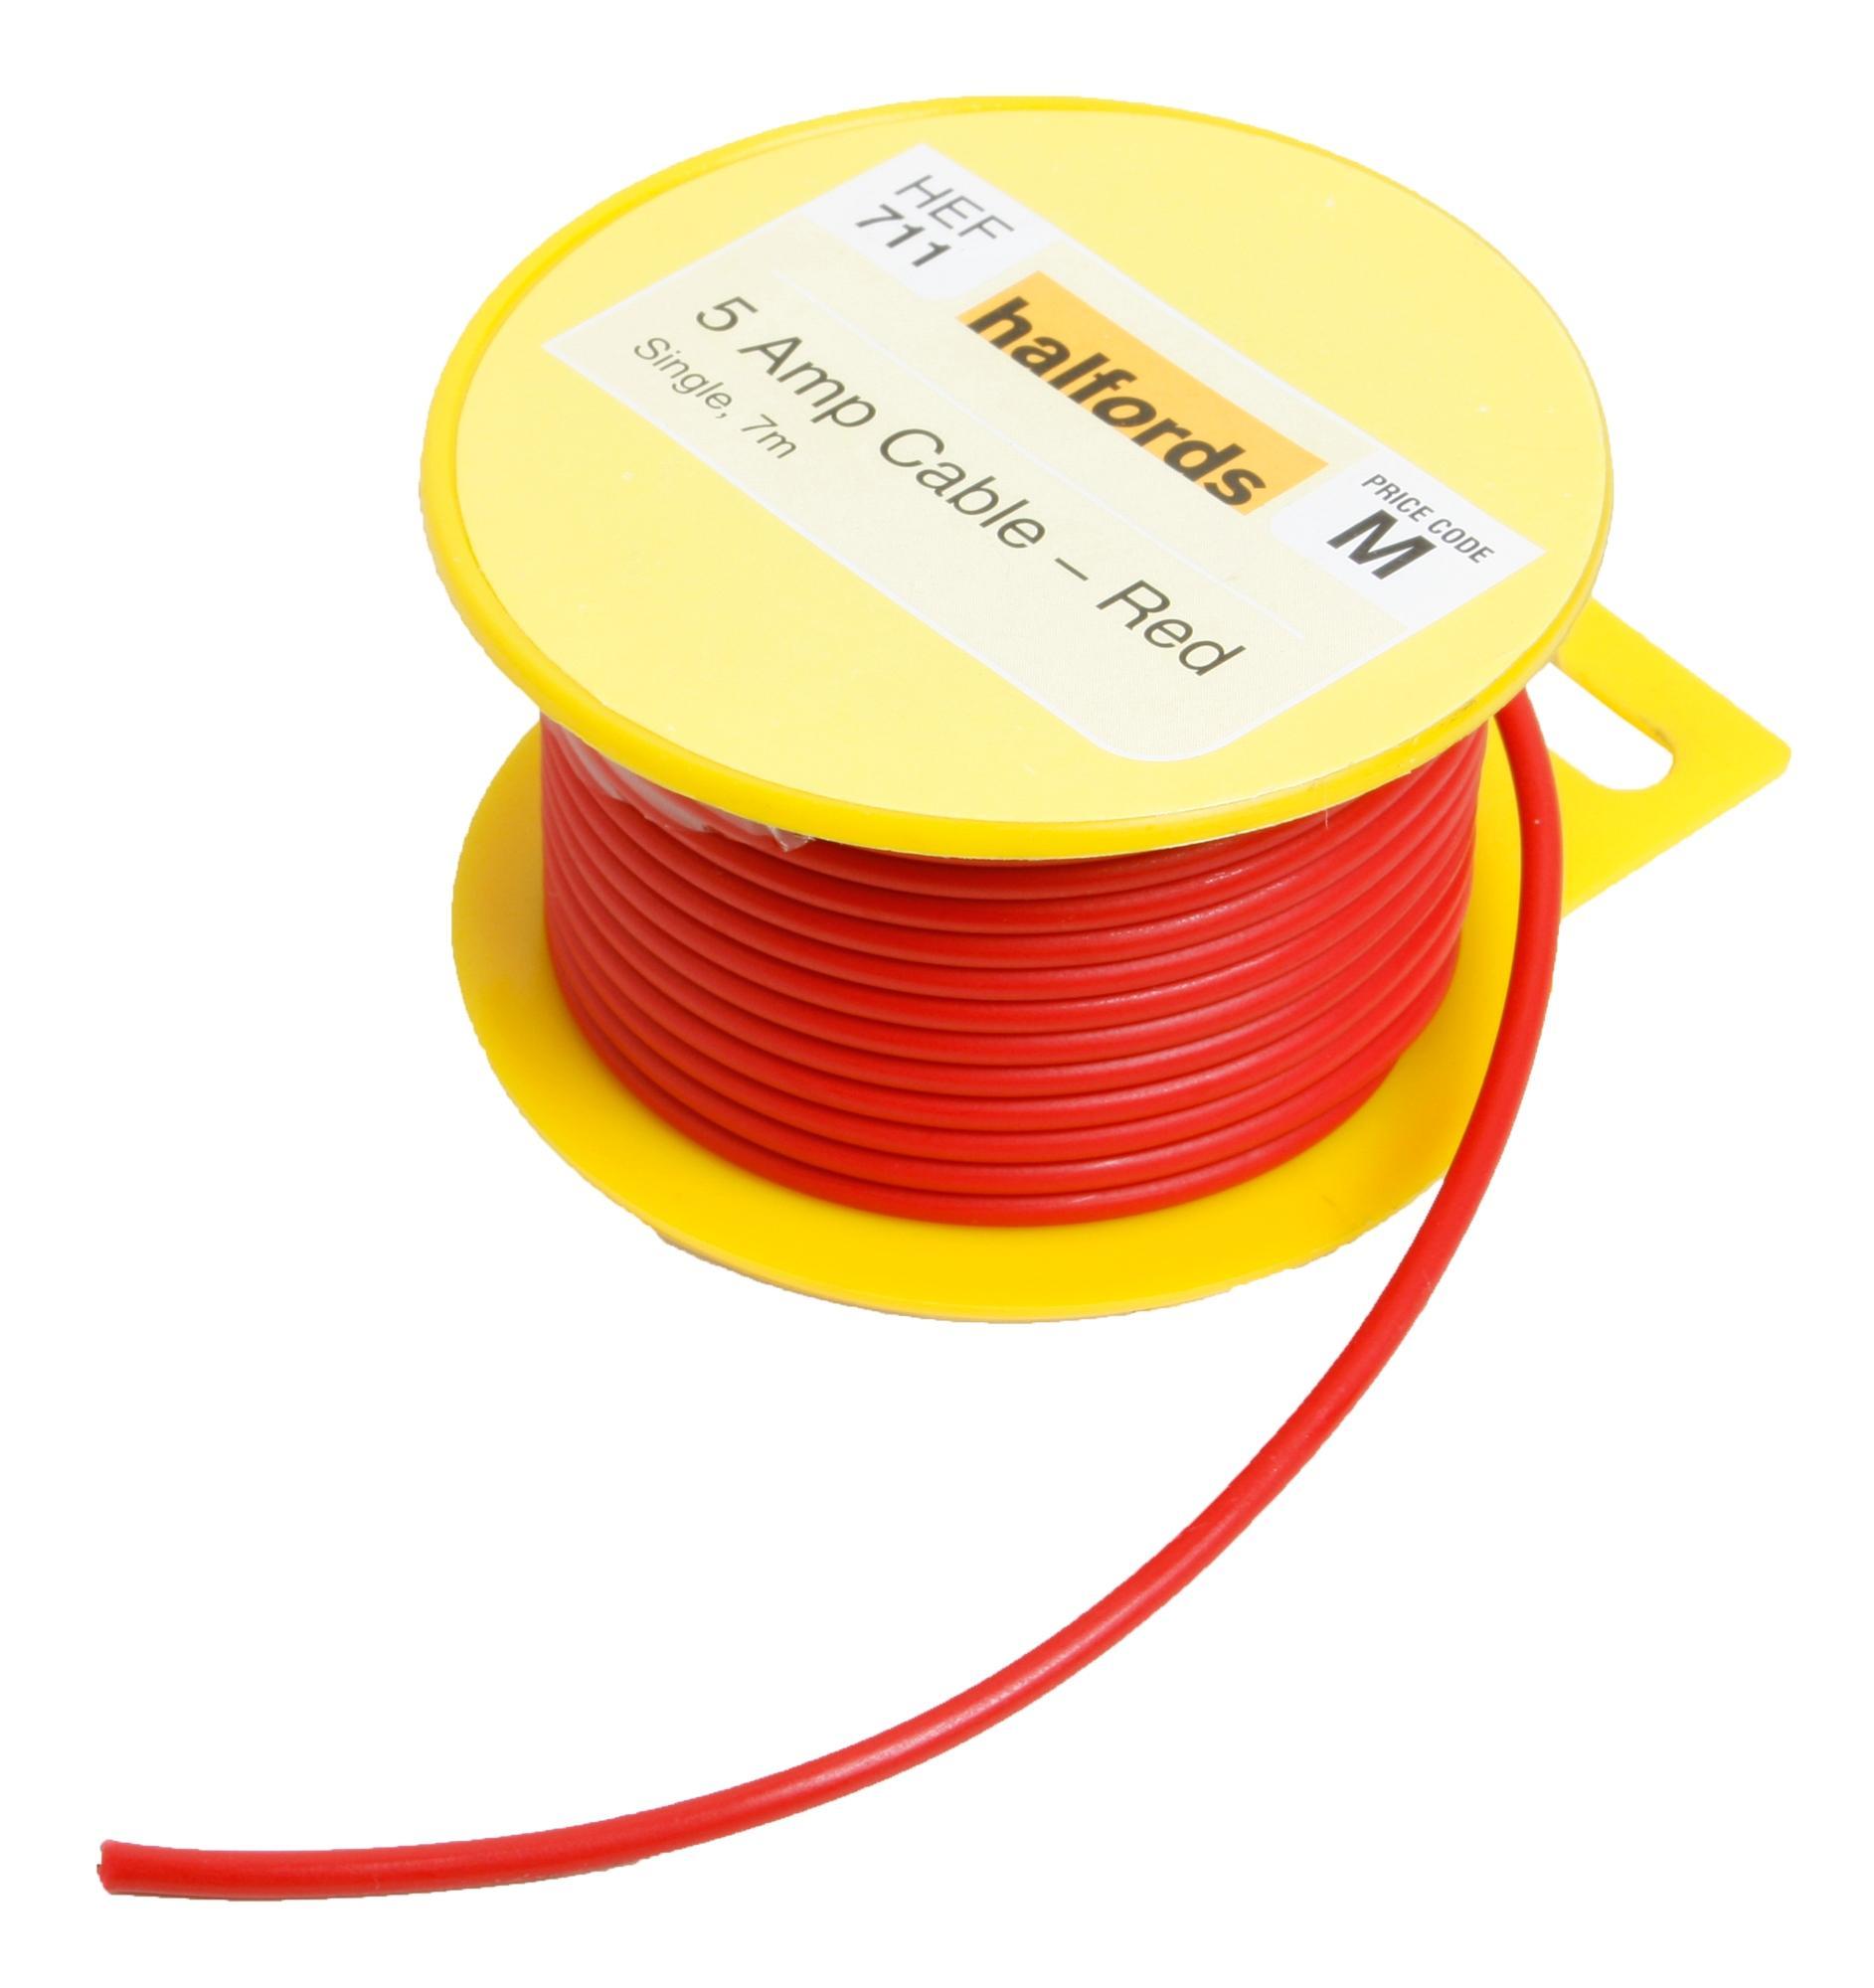 Amp Wiring Kit Halfords Diy Enthusiasts Diagrams Car Amplifier Kits 5 Cable Red Hef711 Rh Com Rockford Fosgate 1000 Watt